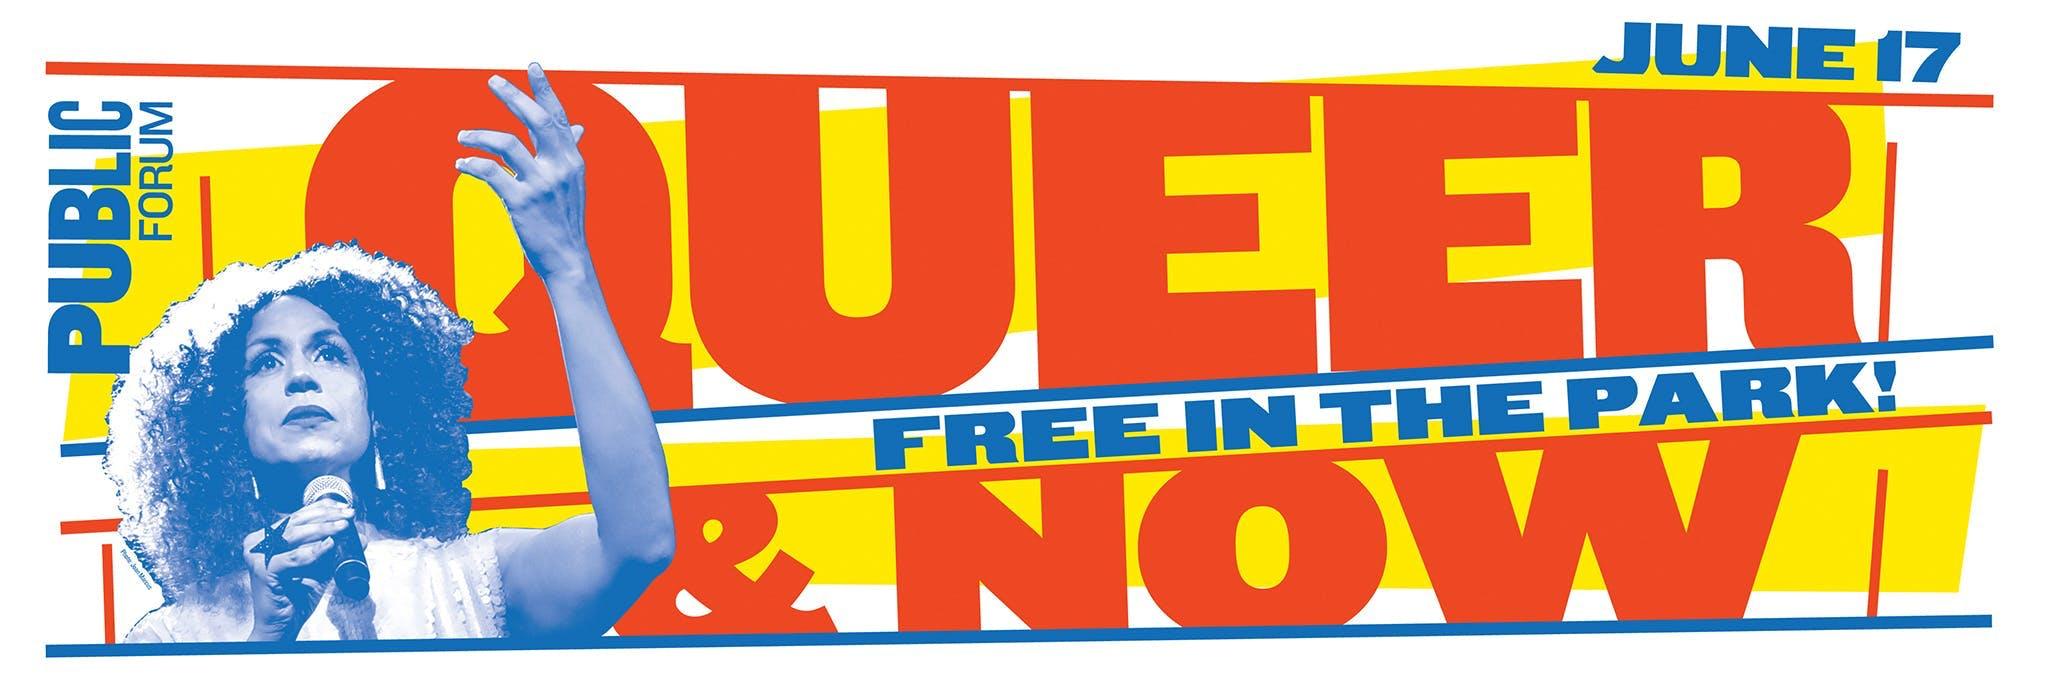 Queer & Now - ADA Accessible Logo